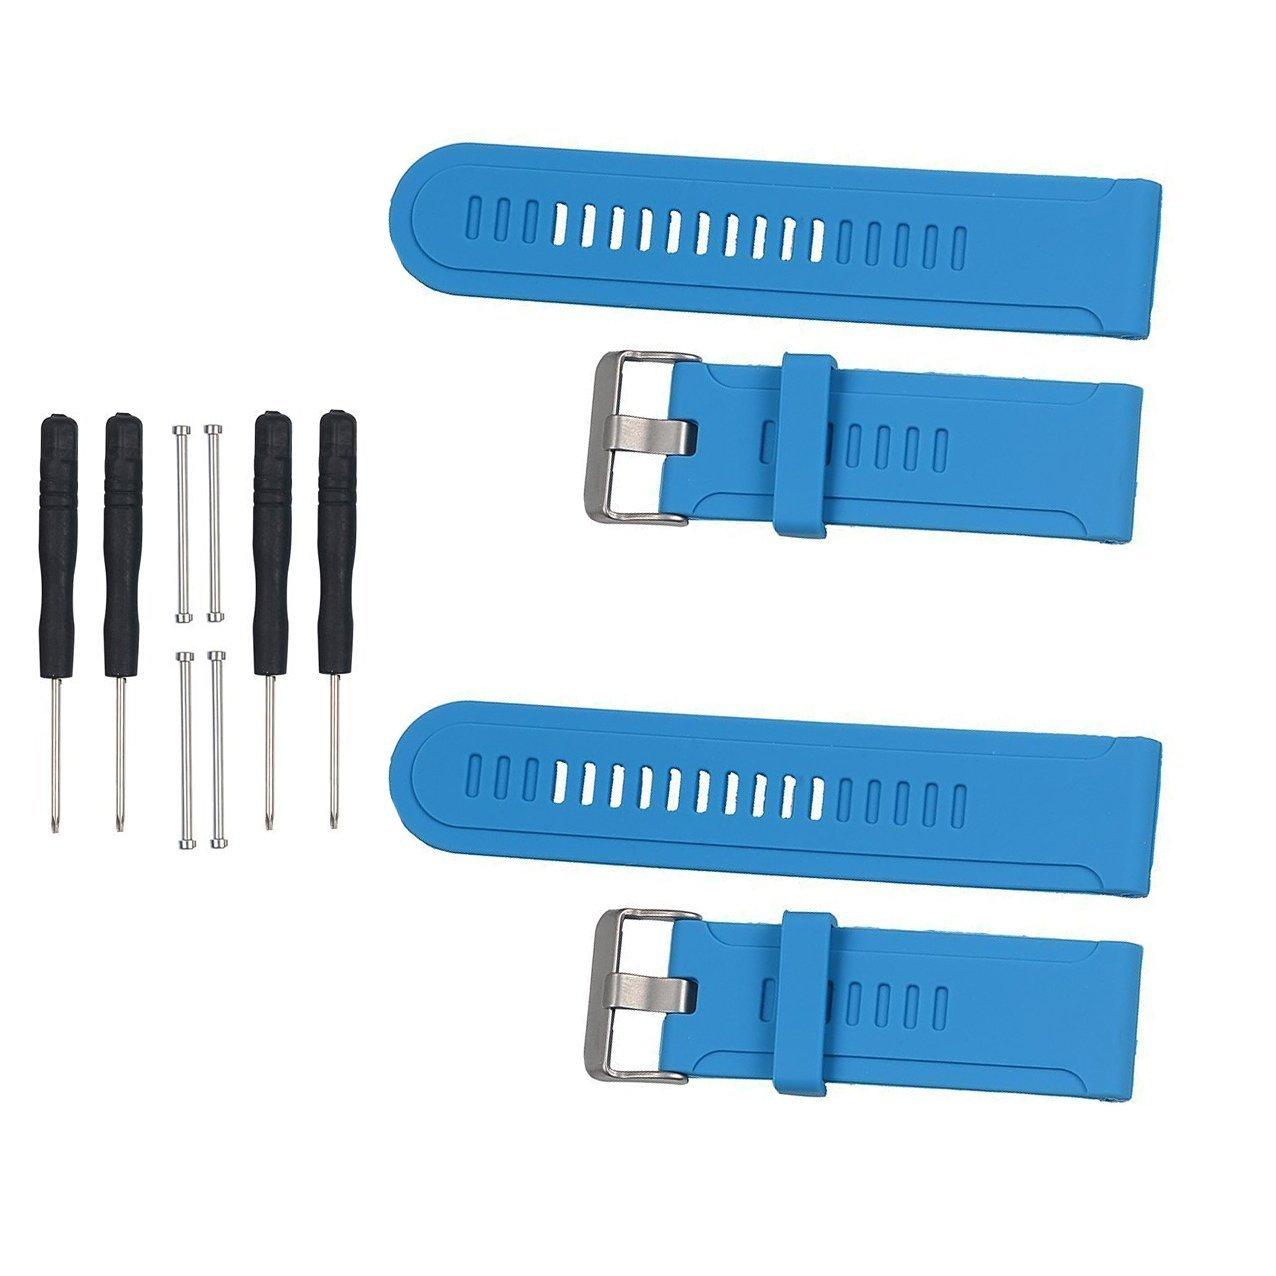 Replacement Bands and Straps for Garmin Fenix 3 HR - 2pcs,Blue+Blue